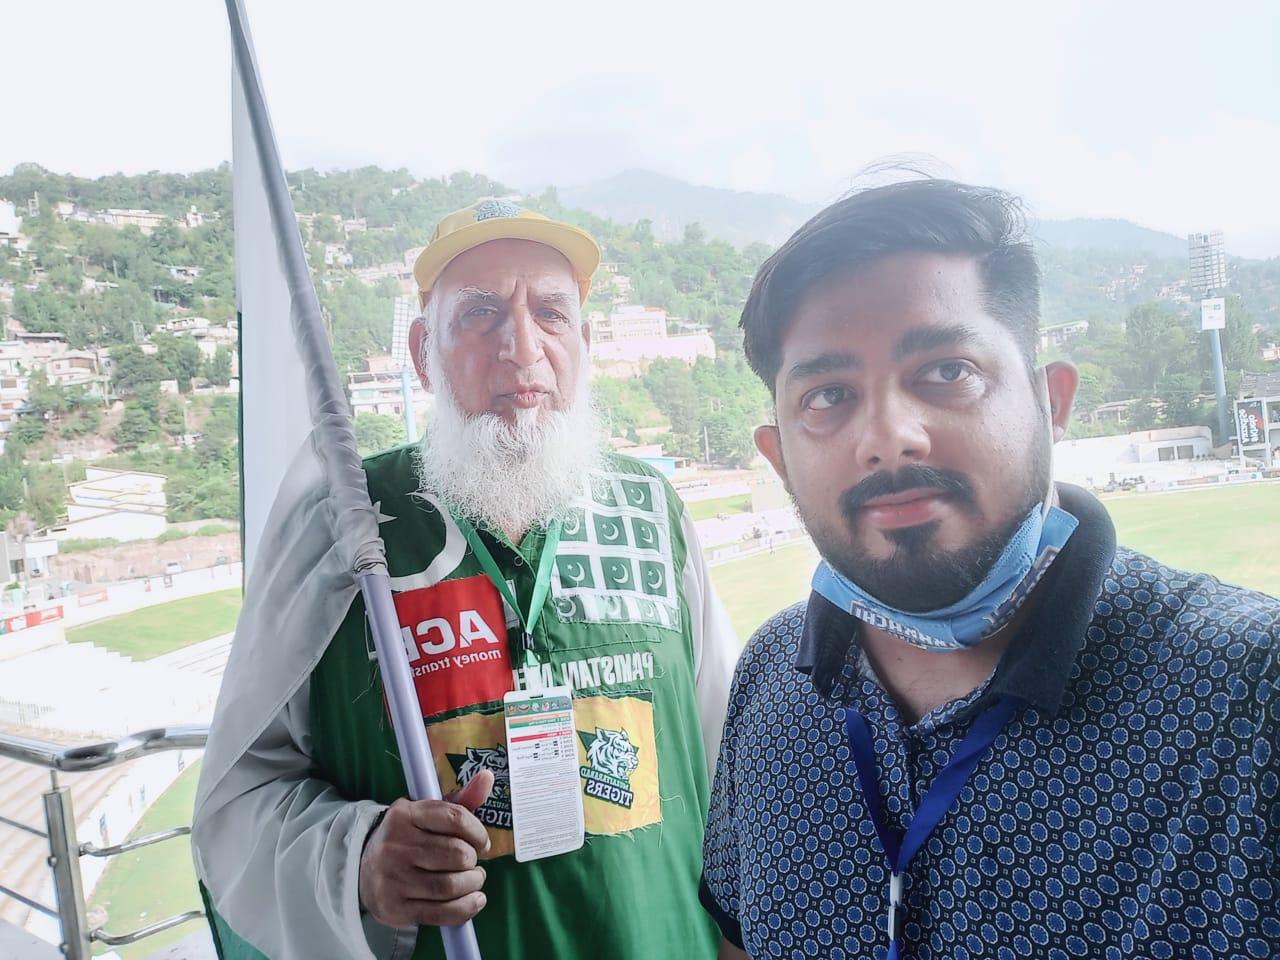 Chacha Cricket reveals his favorite KPL team